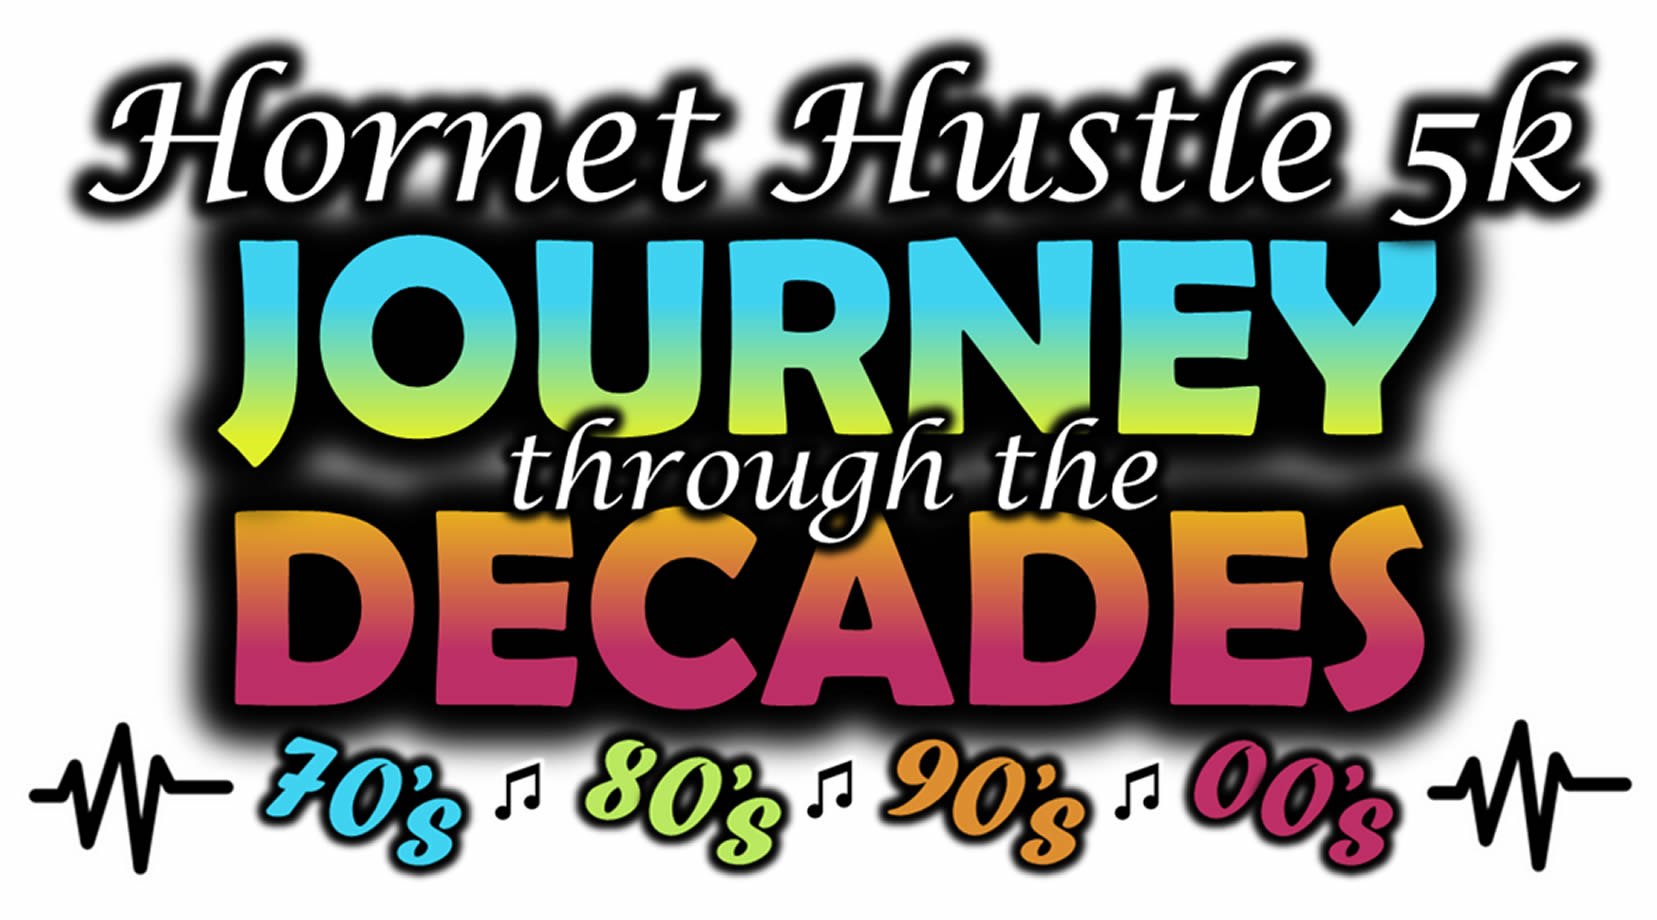 Journey Through the Decades Hornet Hustle 5k